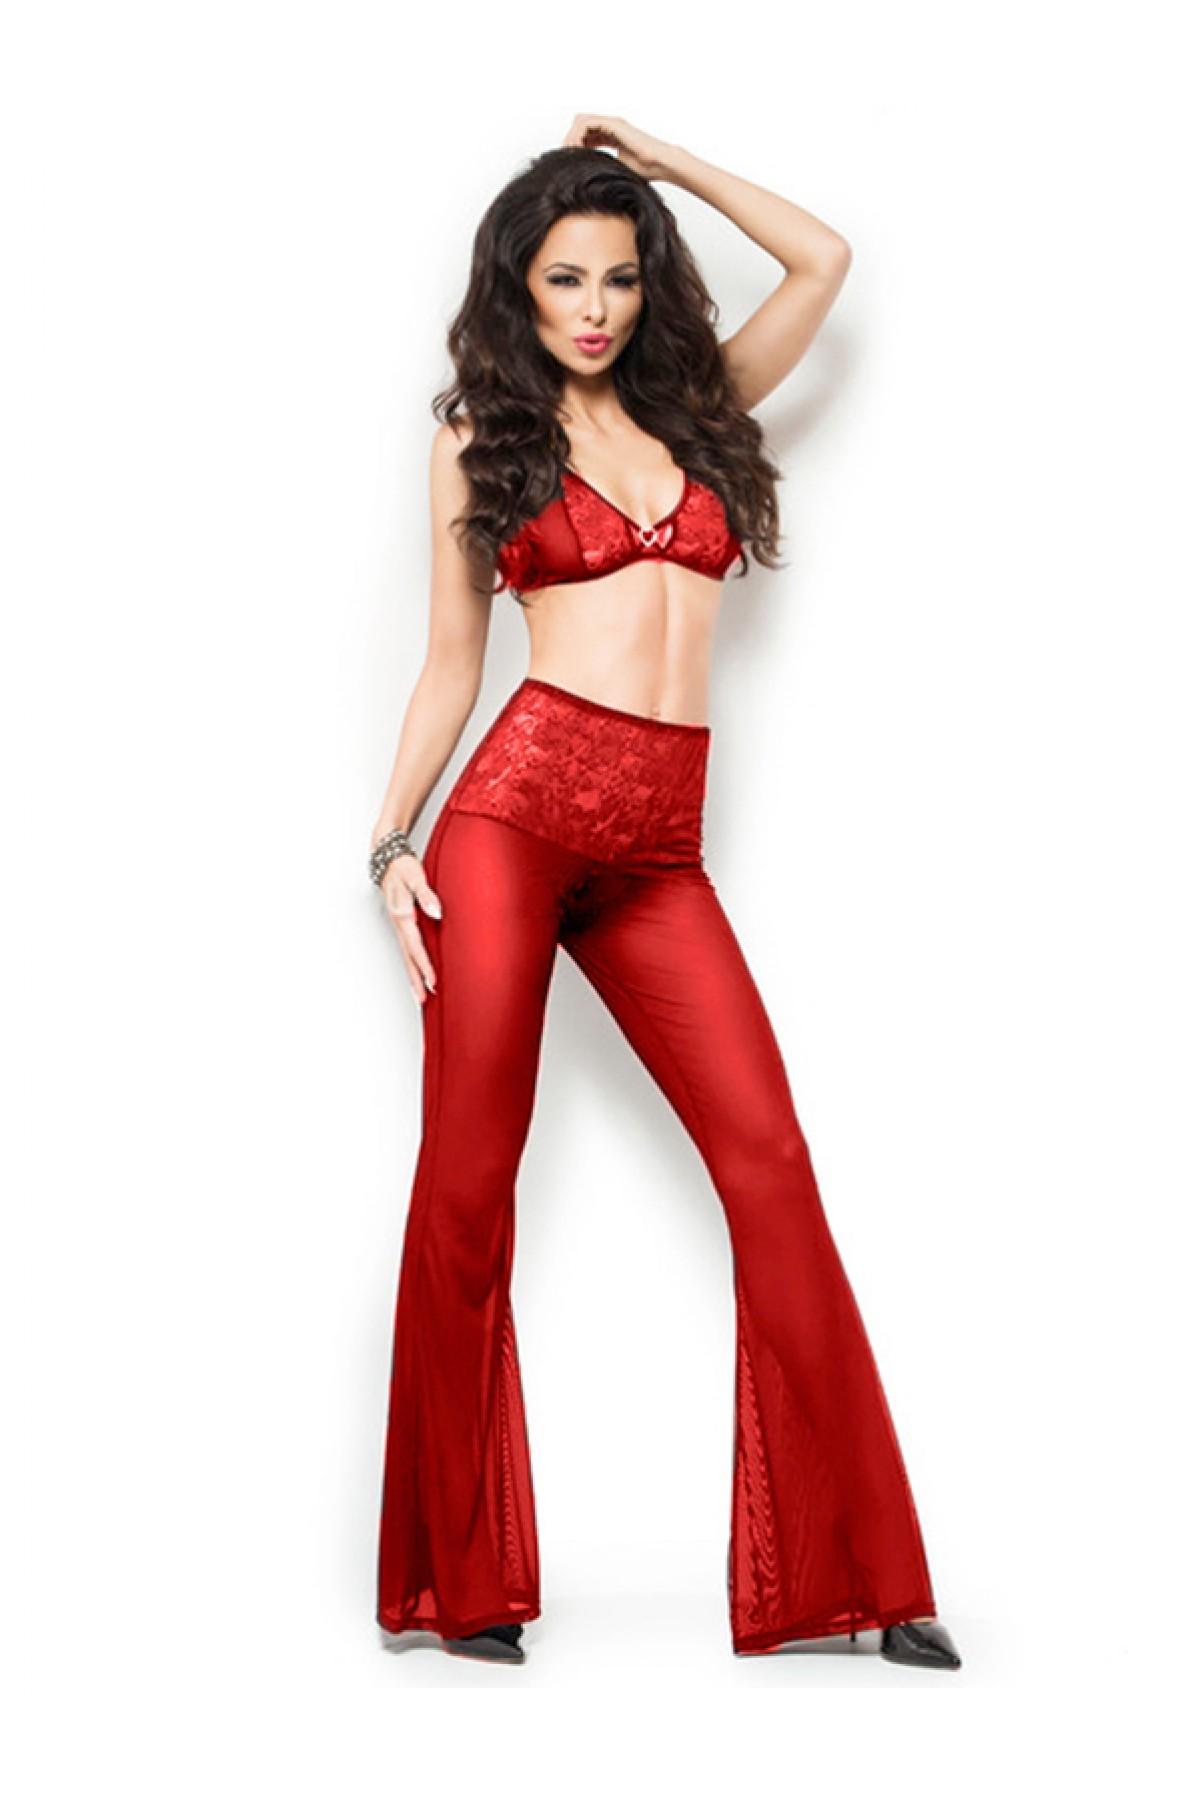 Mite Love Fantazi Giyim Transparan Pantolonlu Takım Kırmızı